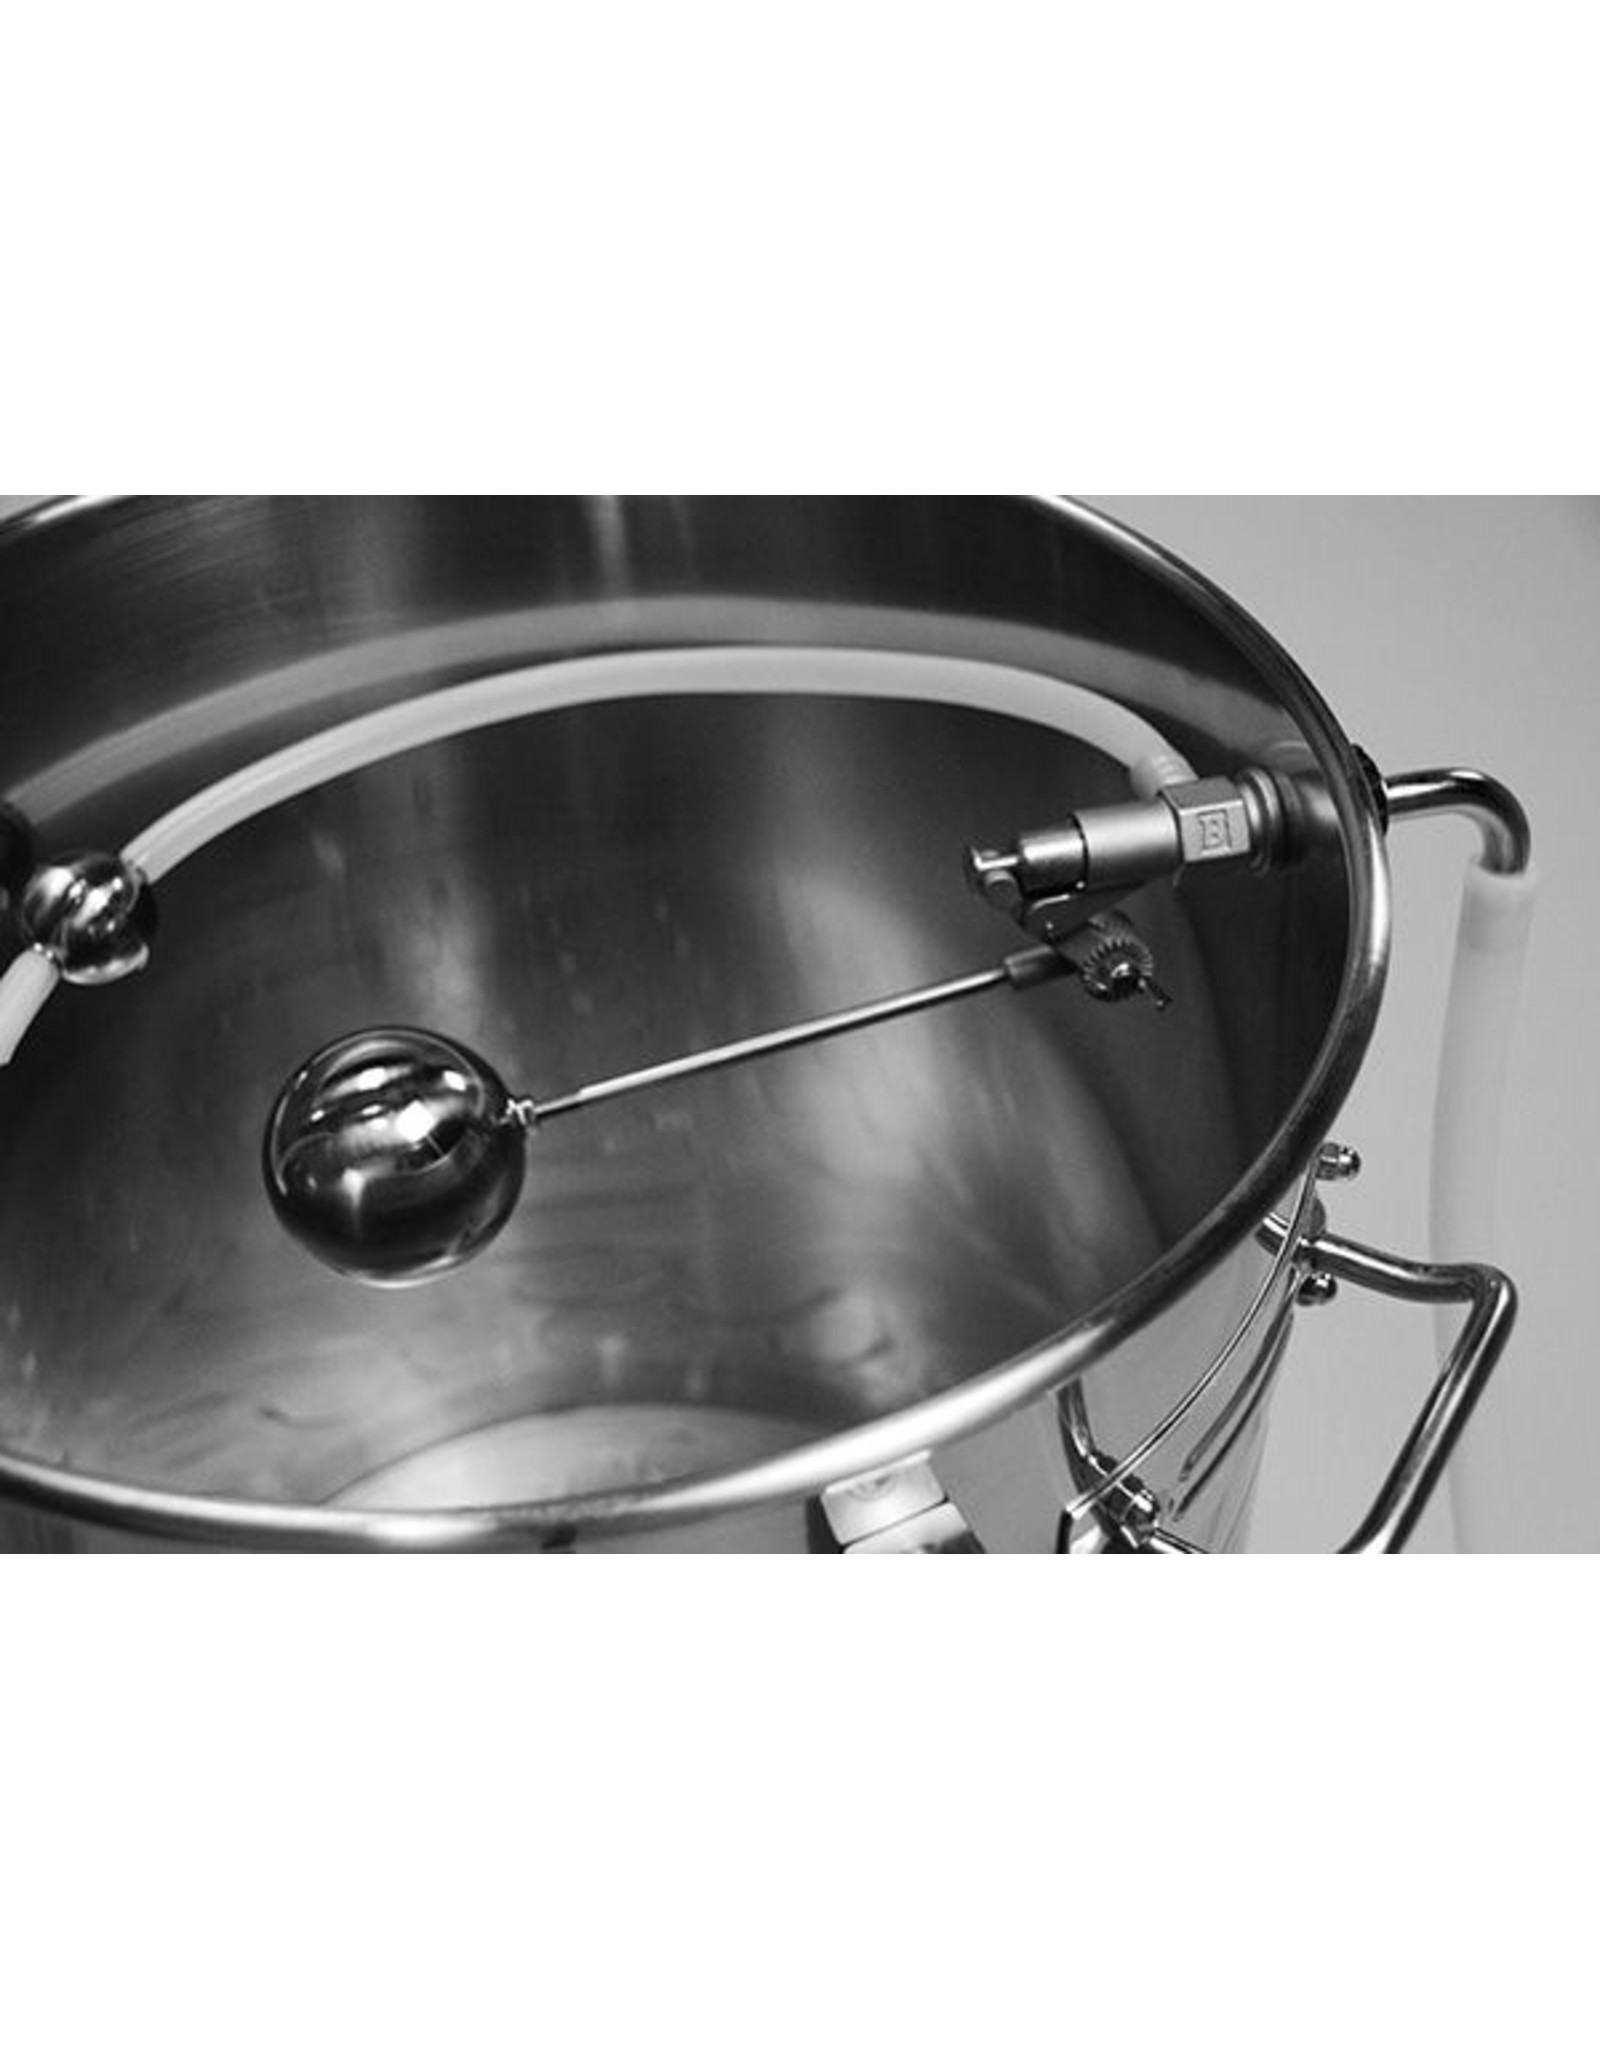 Blichmann Autosparge For Boilermaker Pot